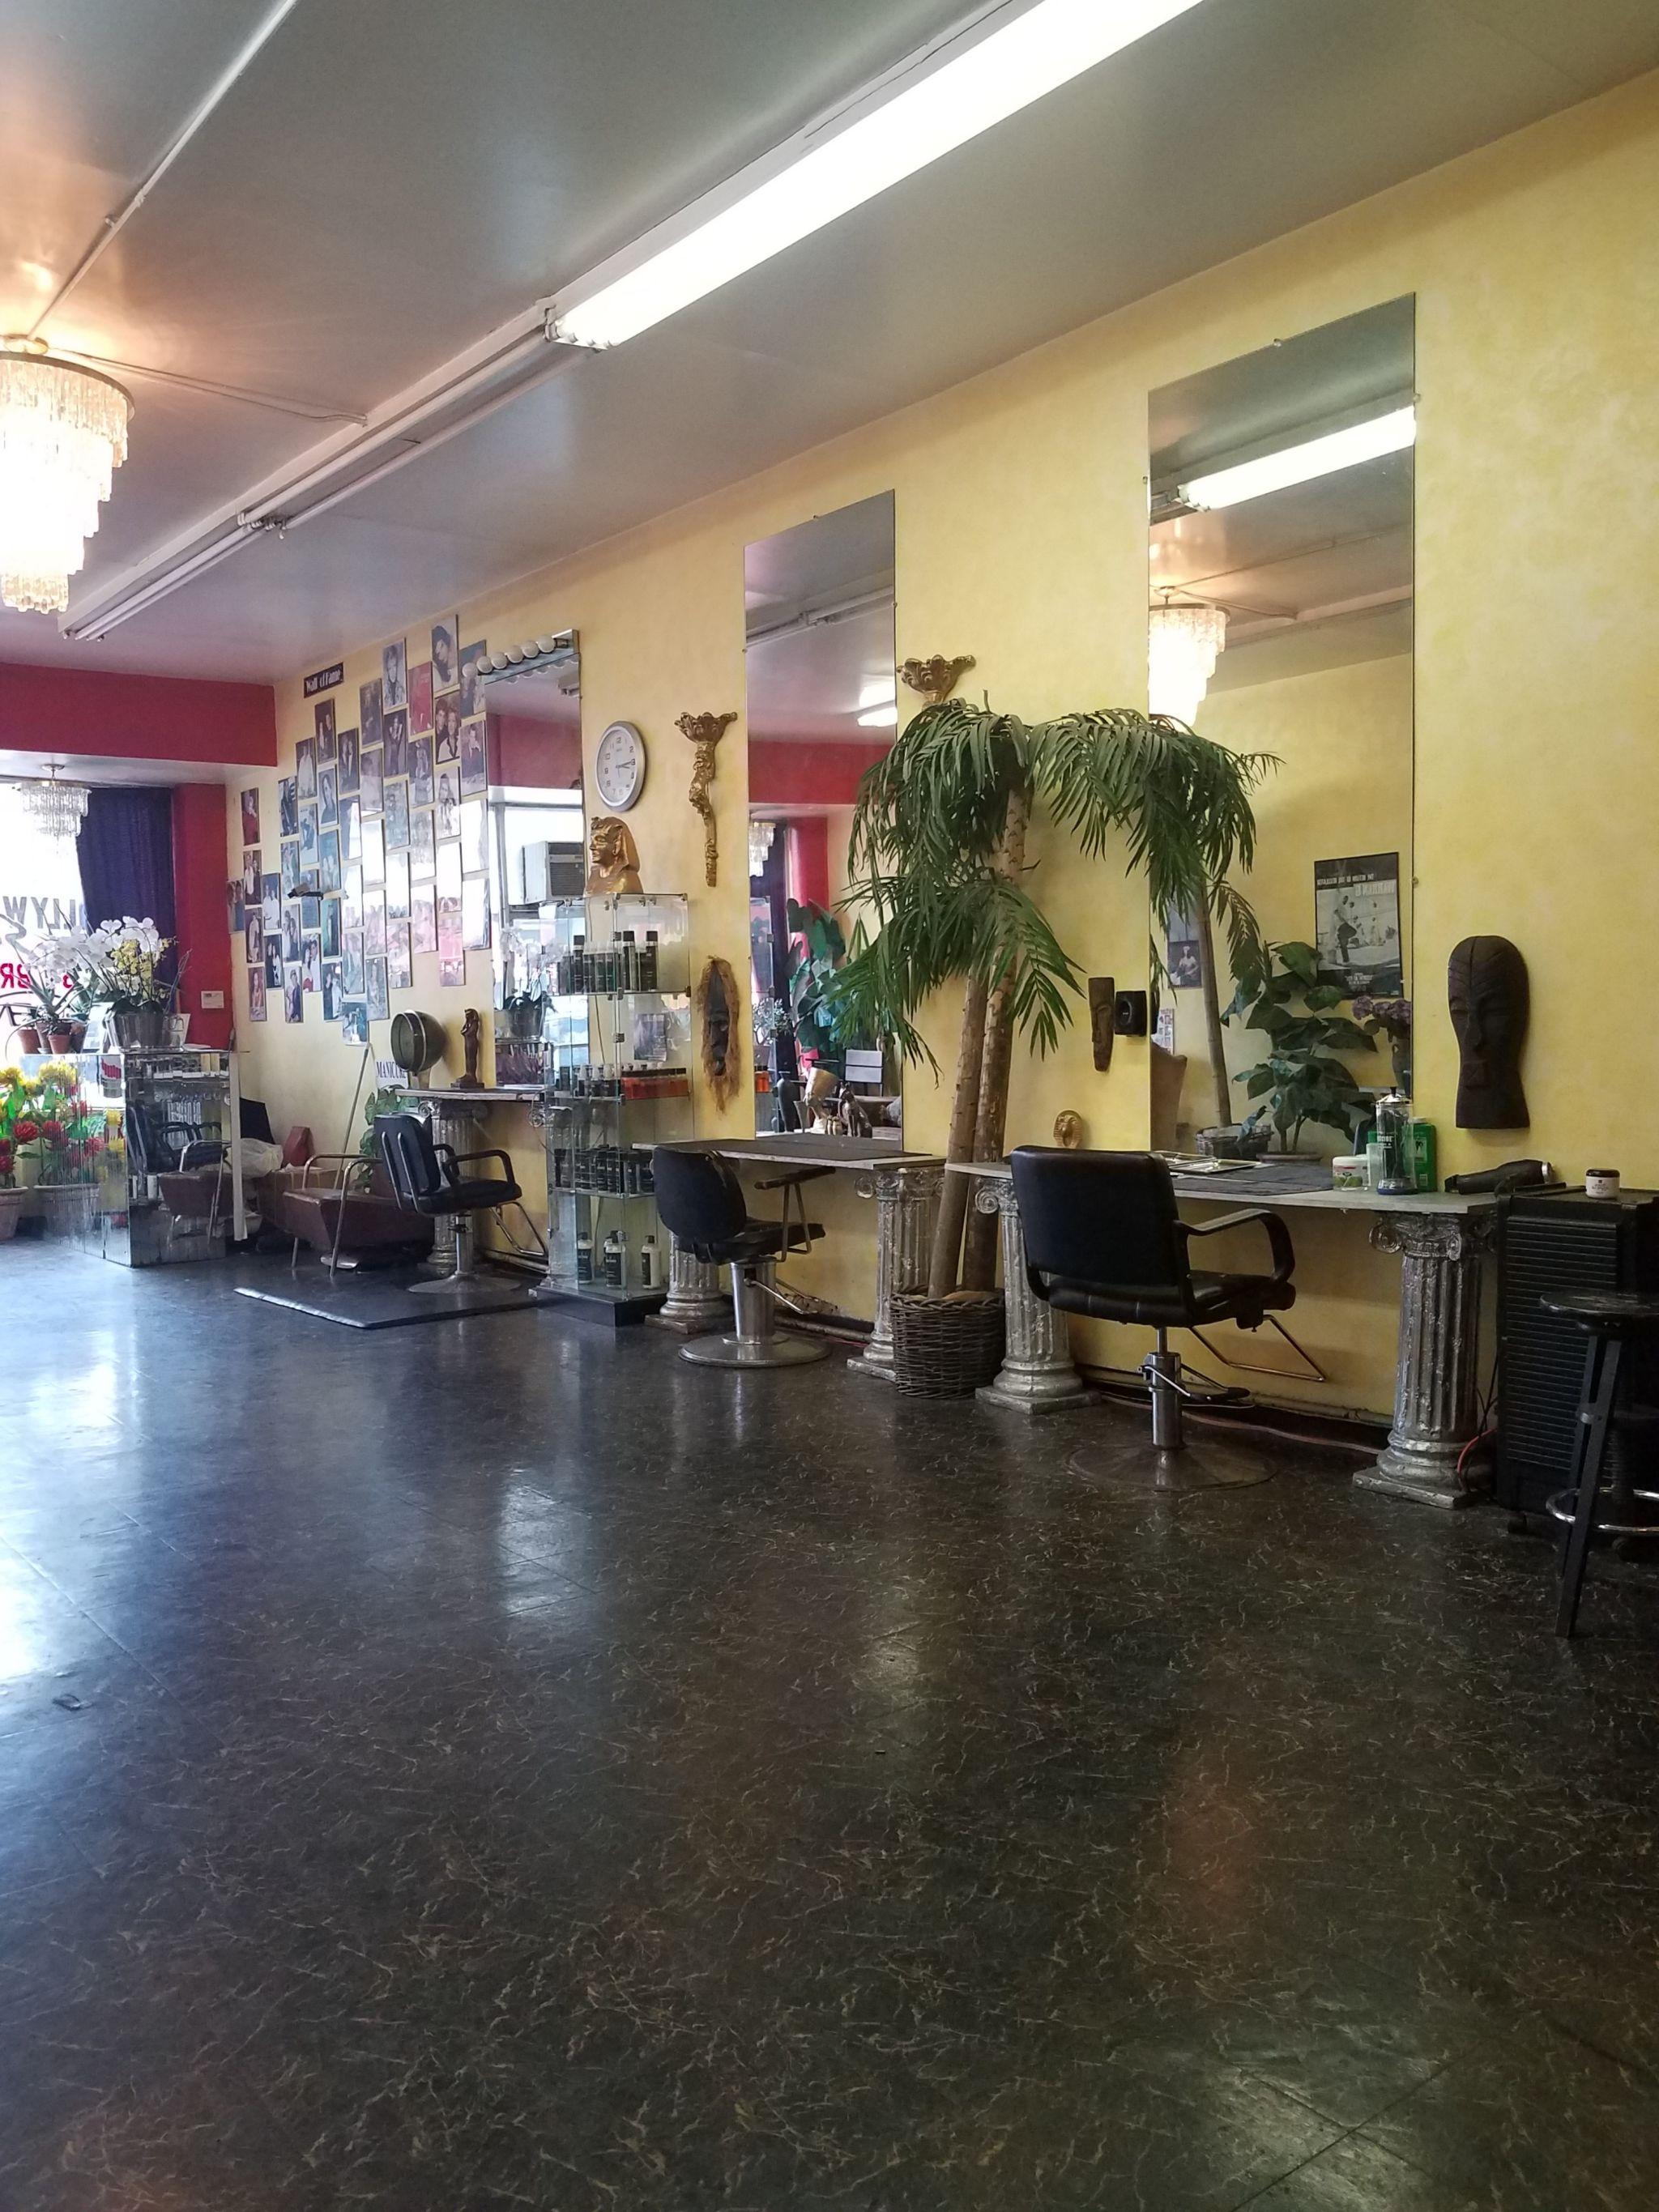 Huge hair salon on cahuenga corridor many possibilities los angeles ca event peerspace